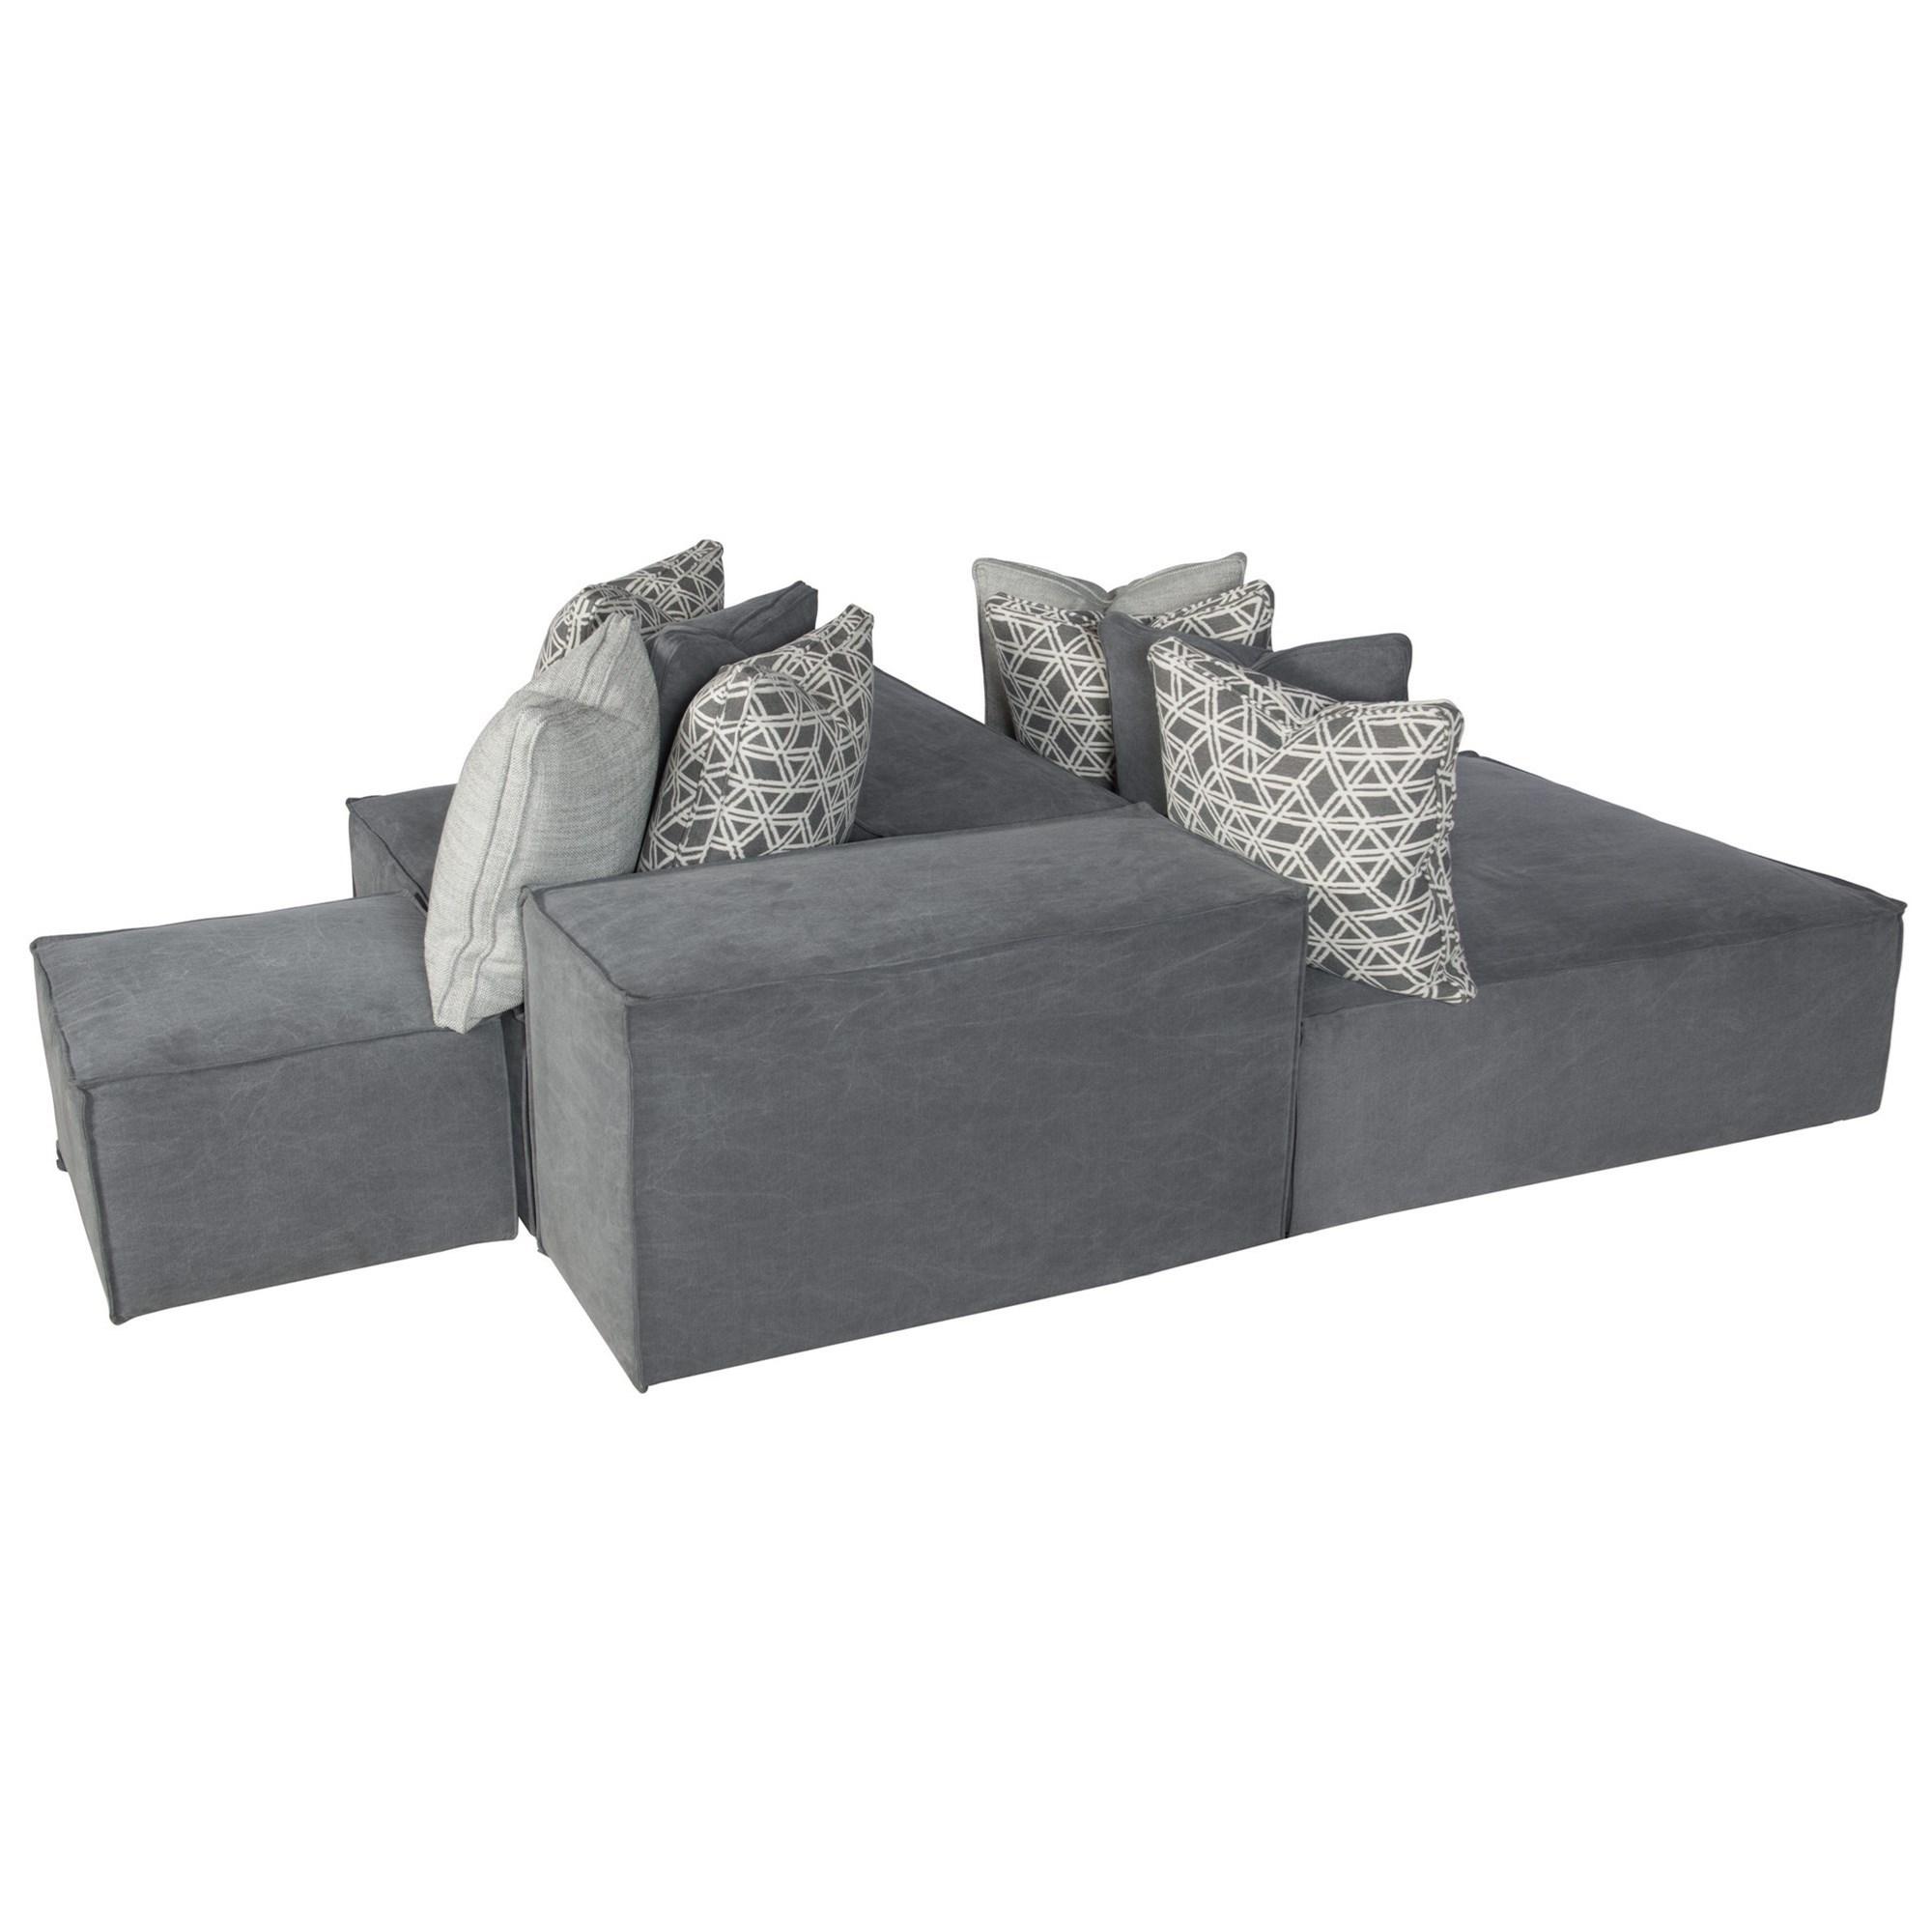 Interiors - Format Sectional Sofa (5-piece) at Williams & Kay